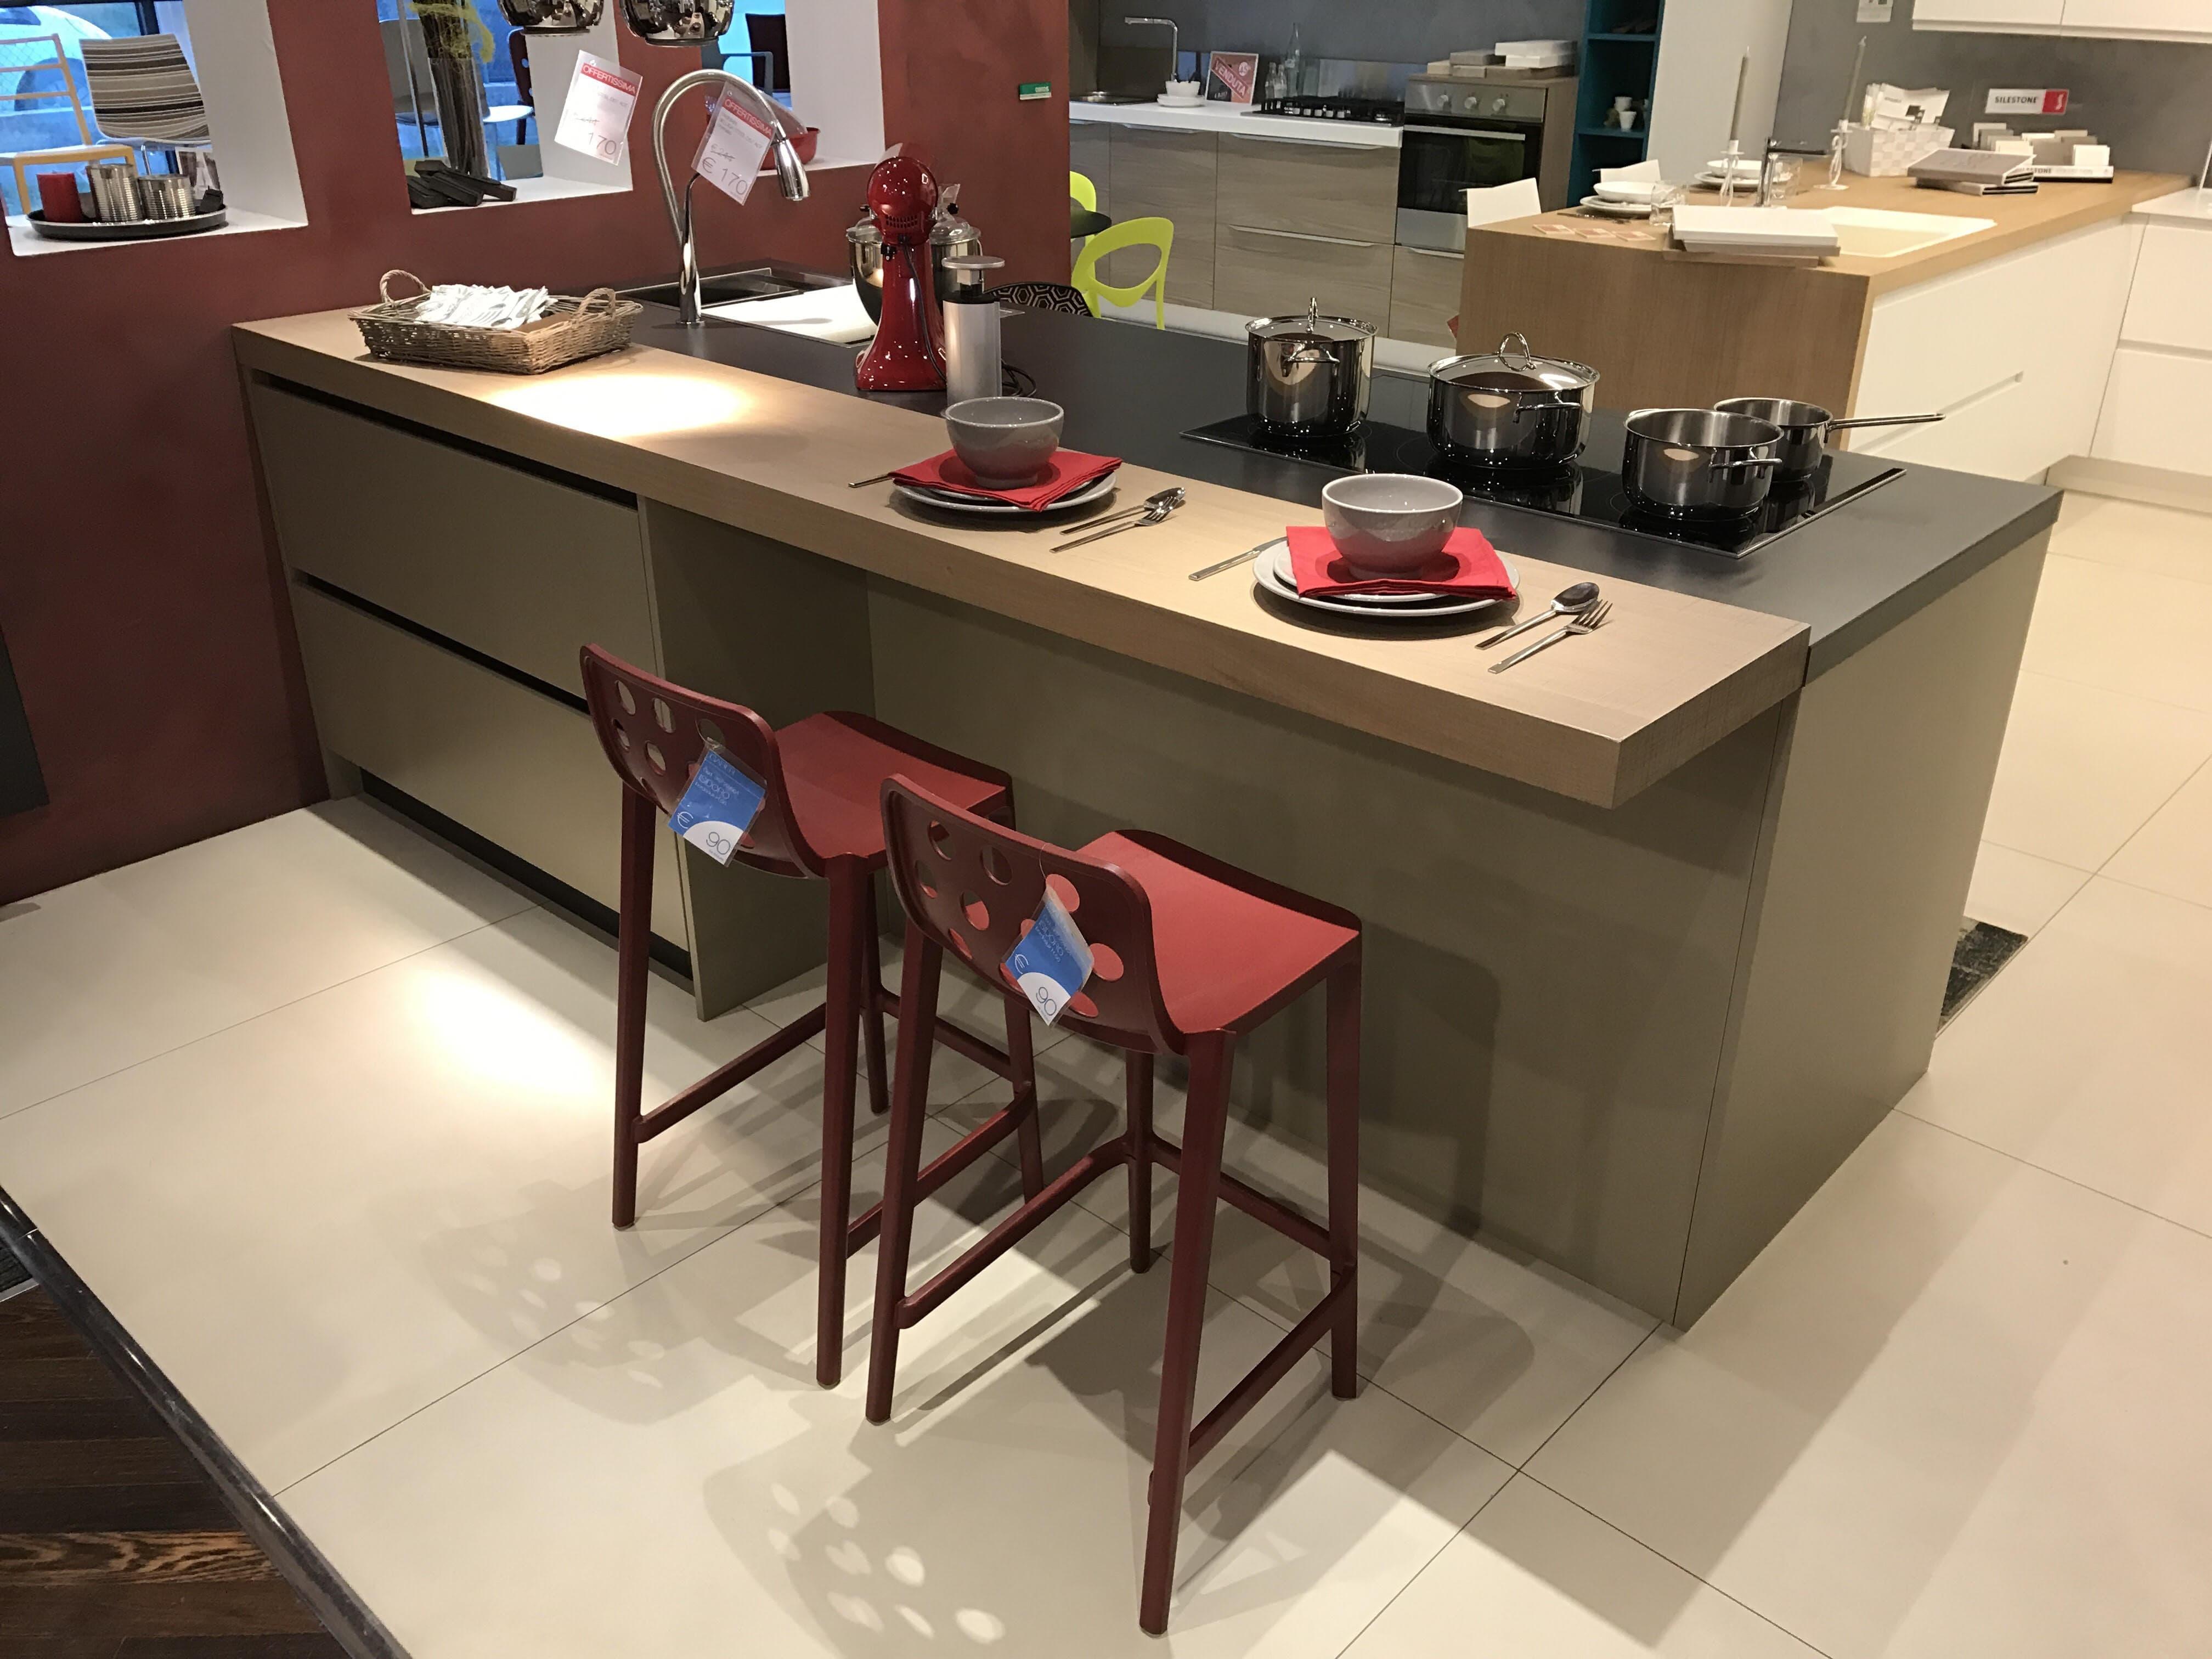 Essebi cucine cucina seta color scontato del 55 cucine - Cucine essebi prezzi ...